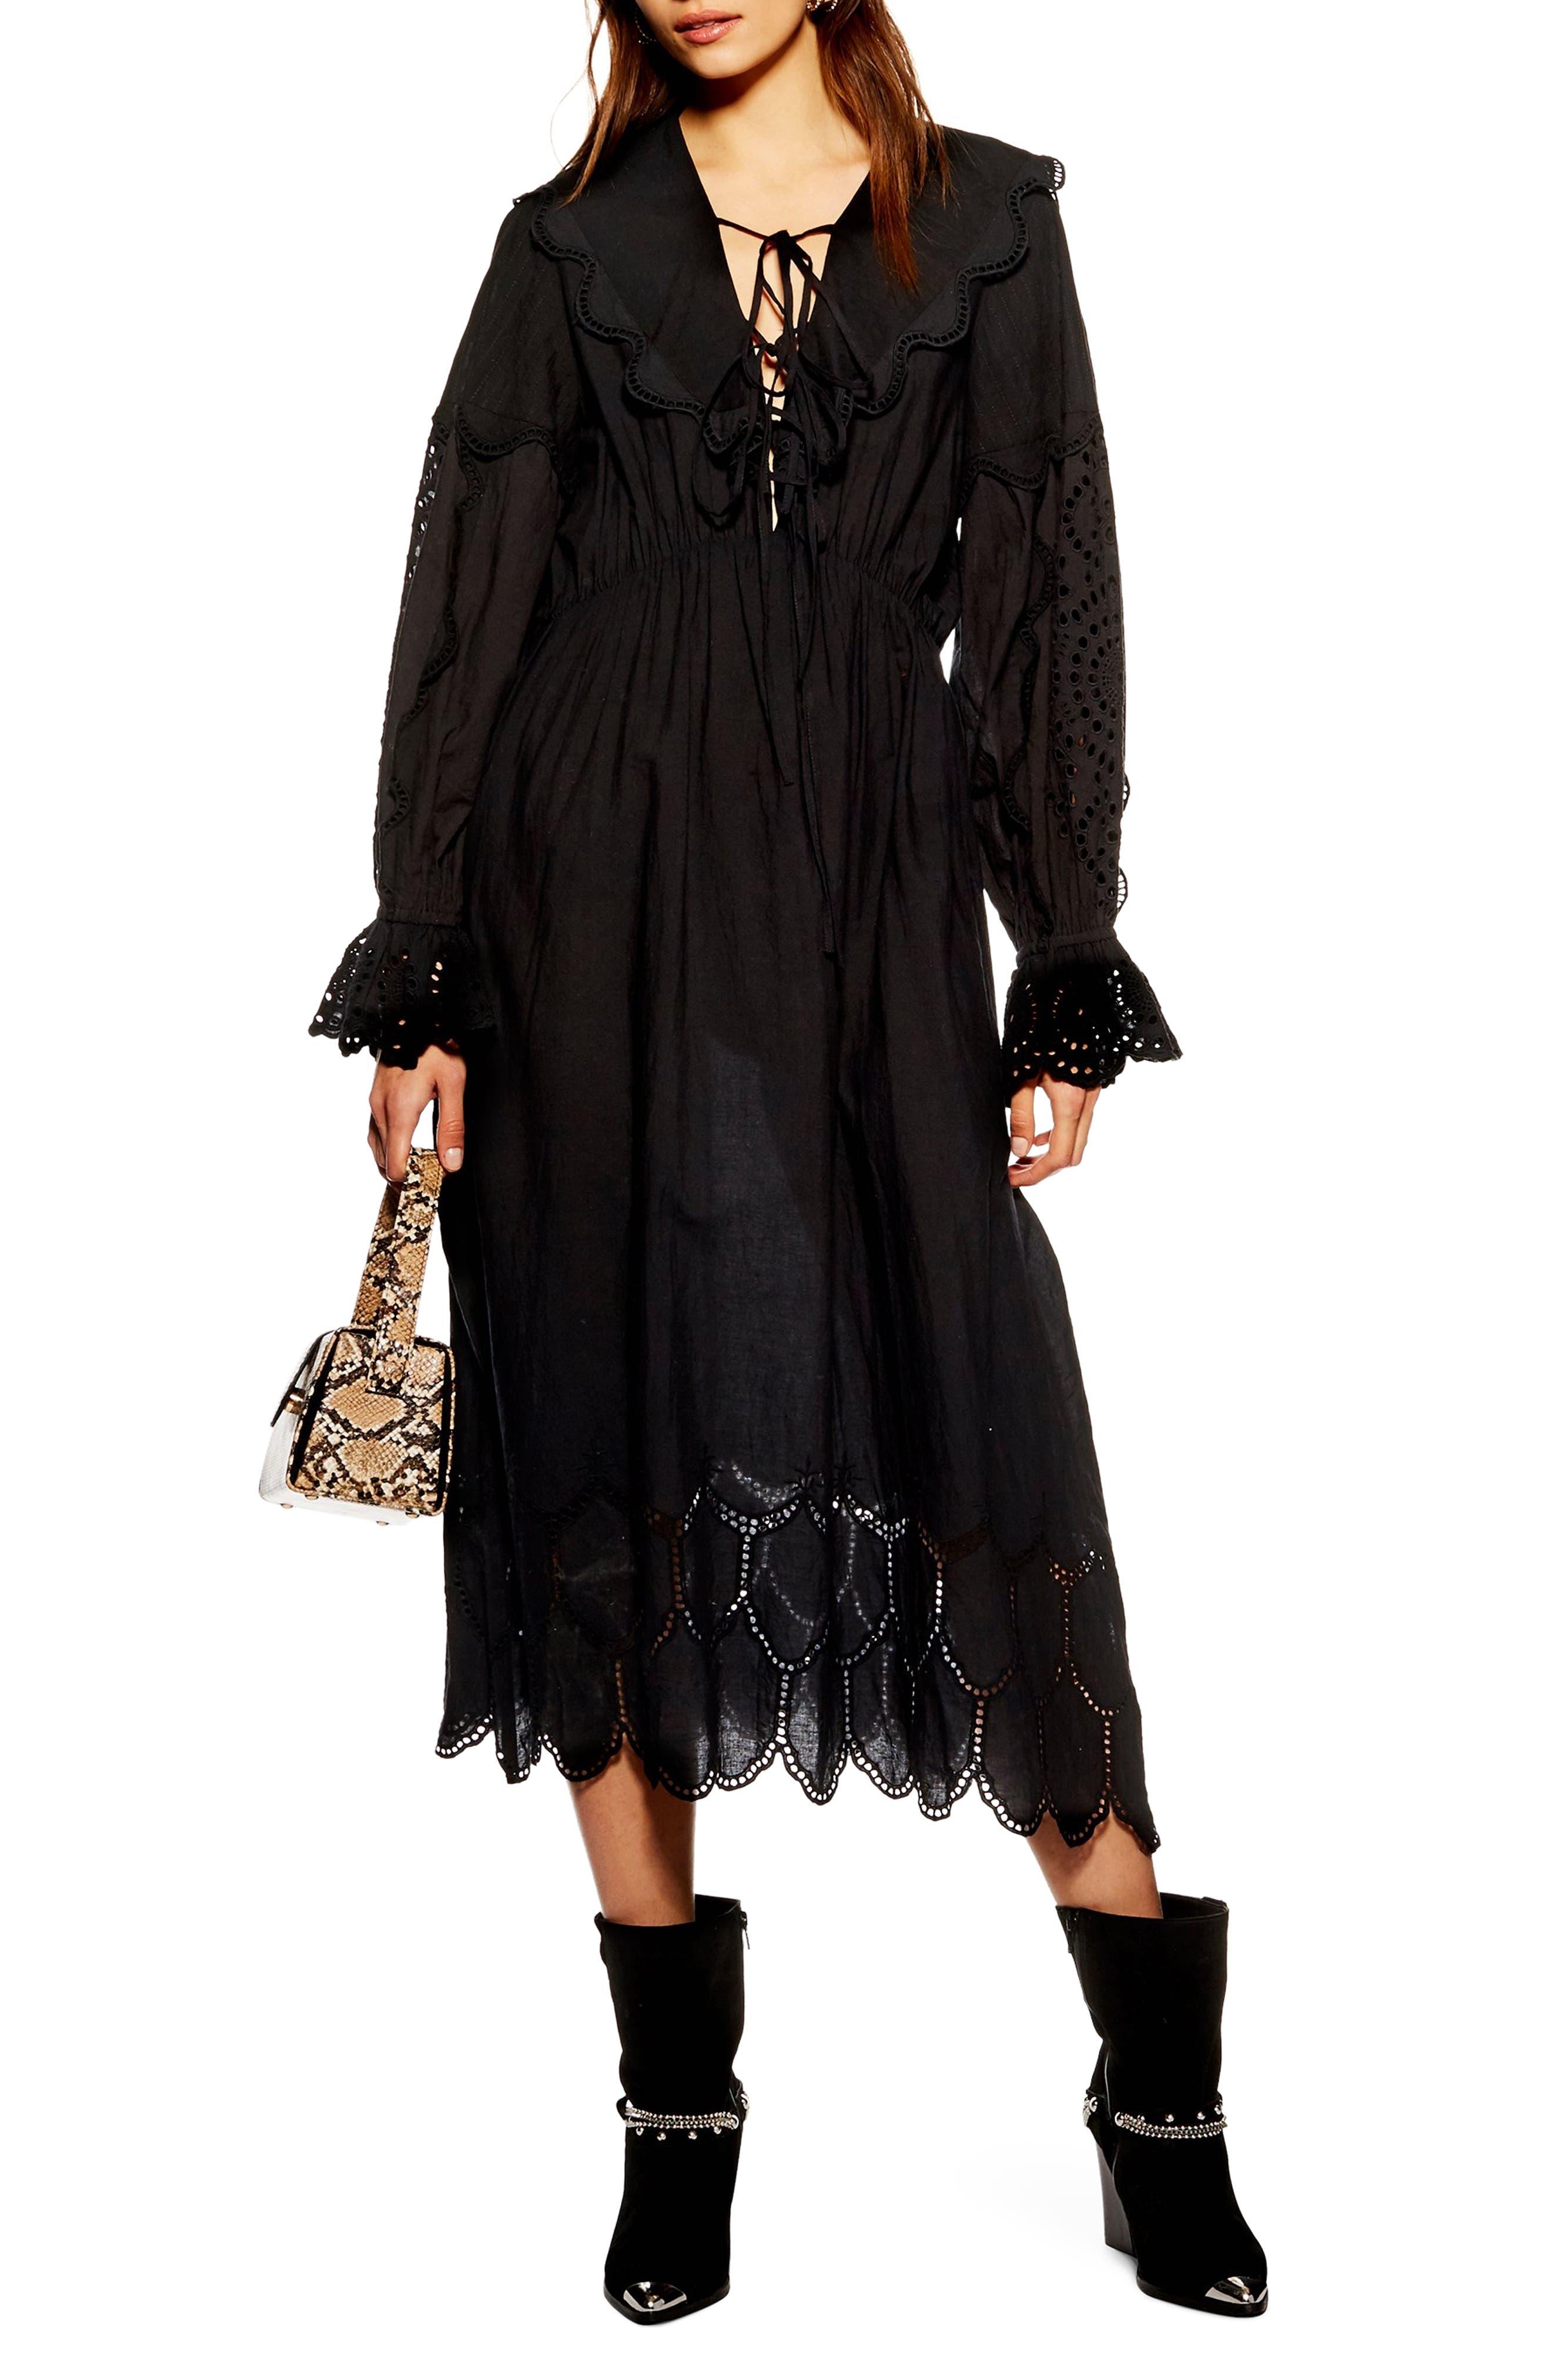 Topshop Broderie Midi Dress, US (fits like 0) - Black